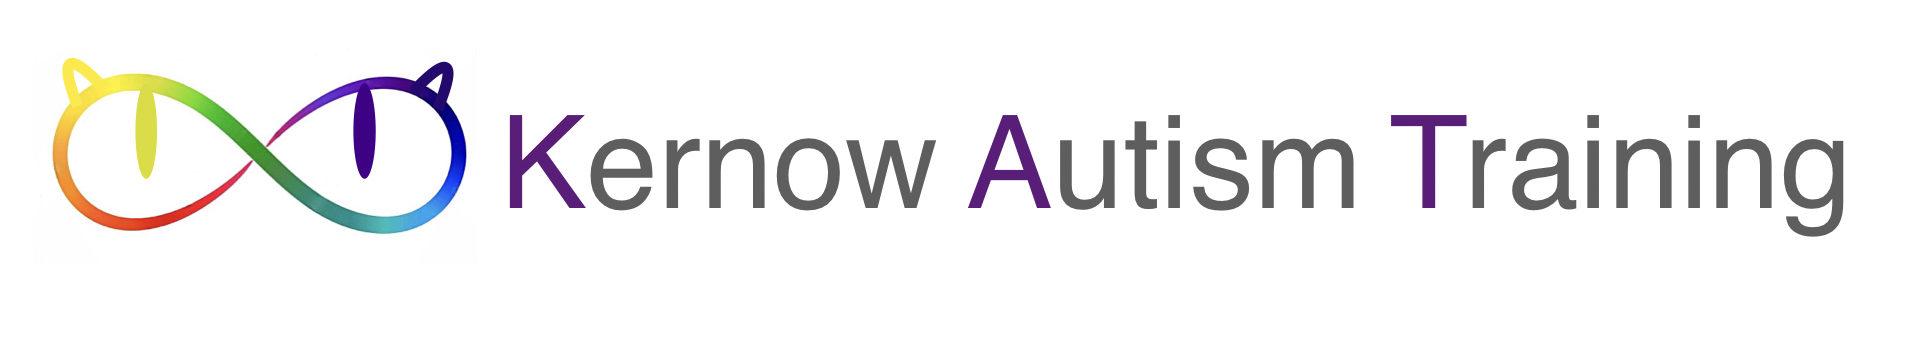 Kernow Autism Training